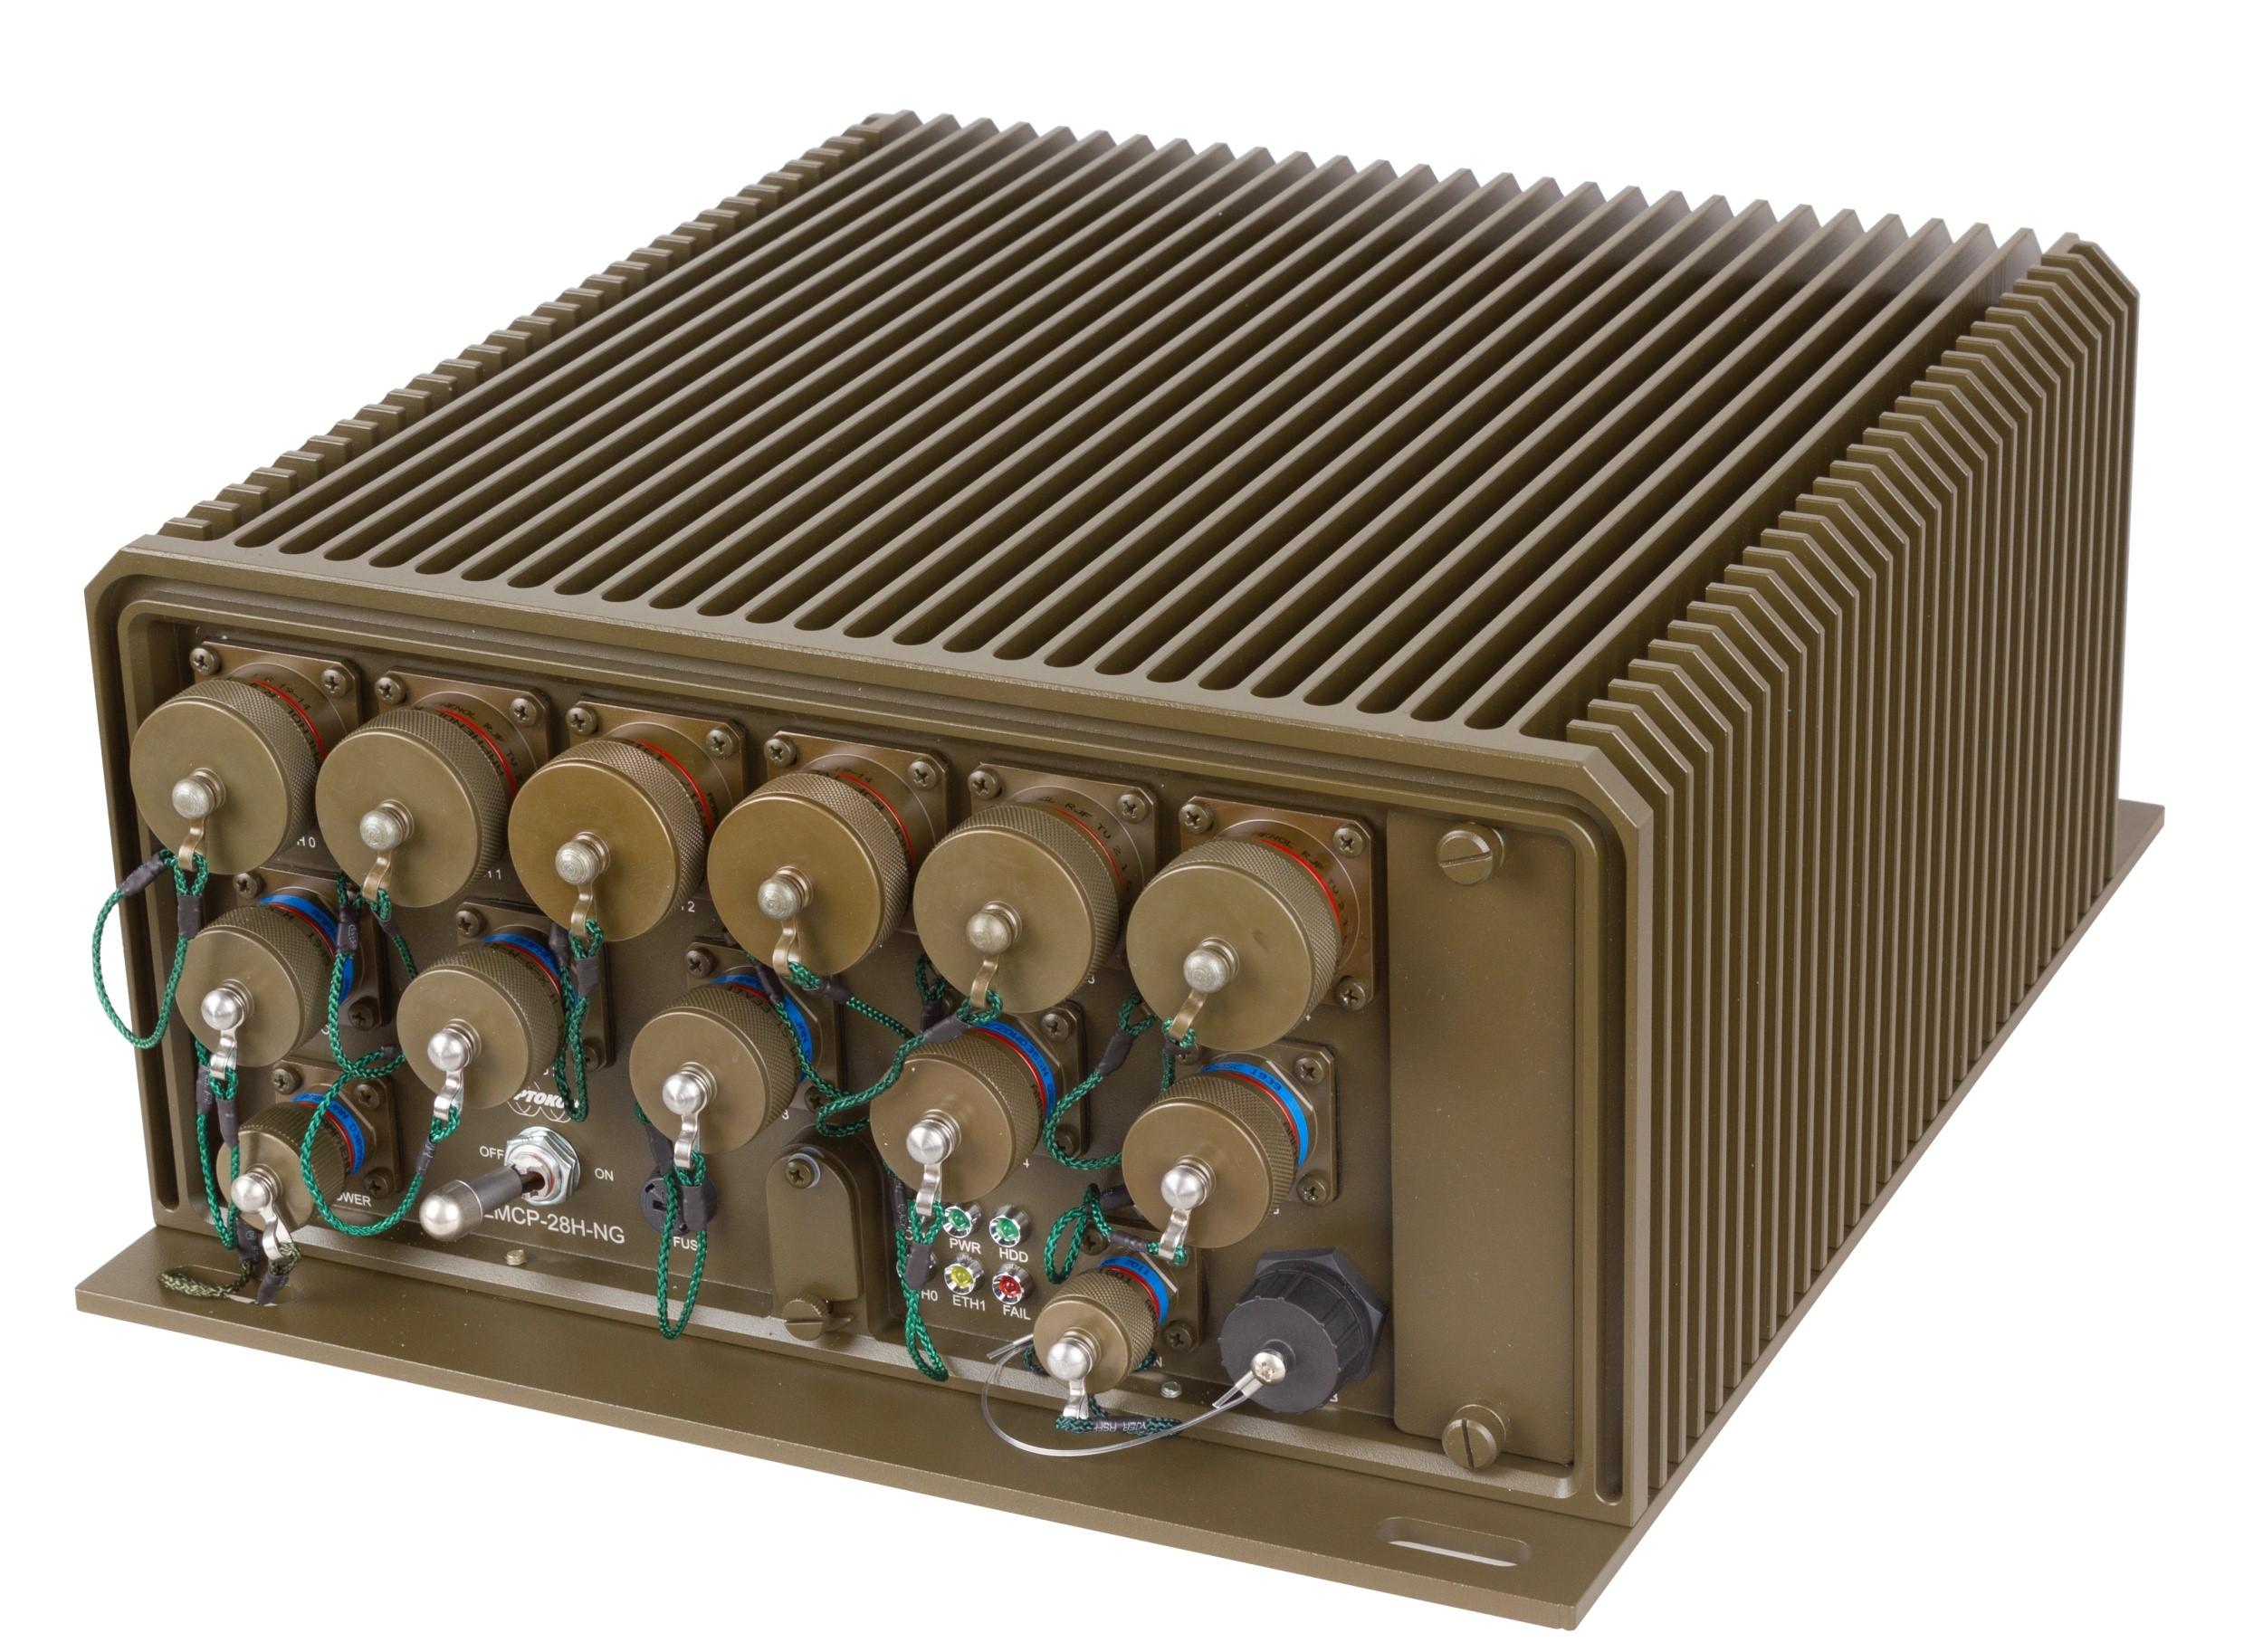 LMCP-28H-xxC-NG Light Mobile Computing Platform